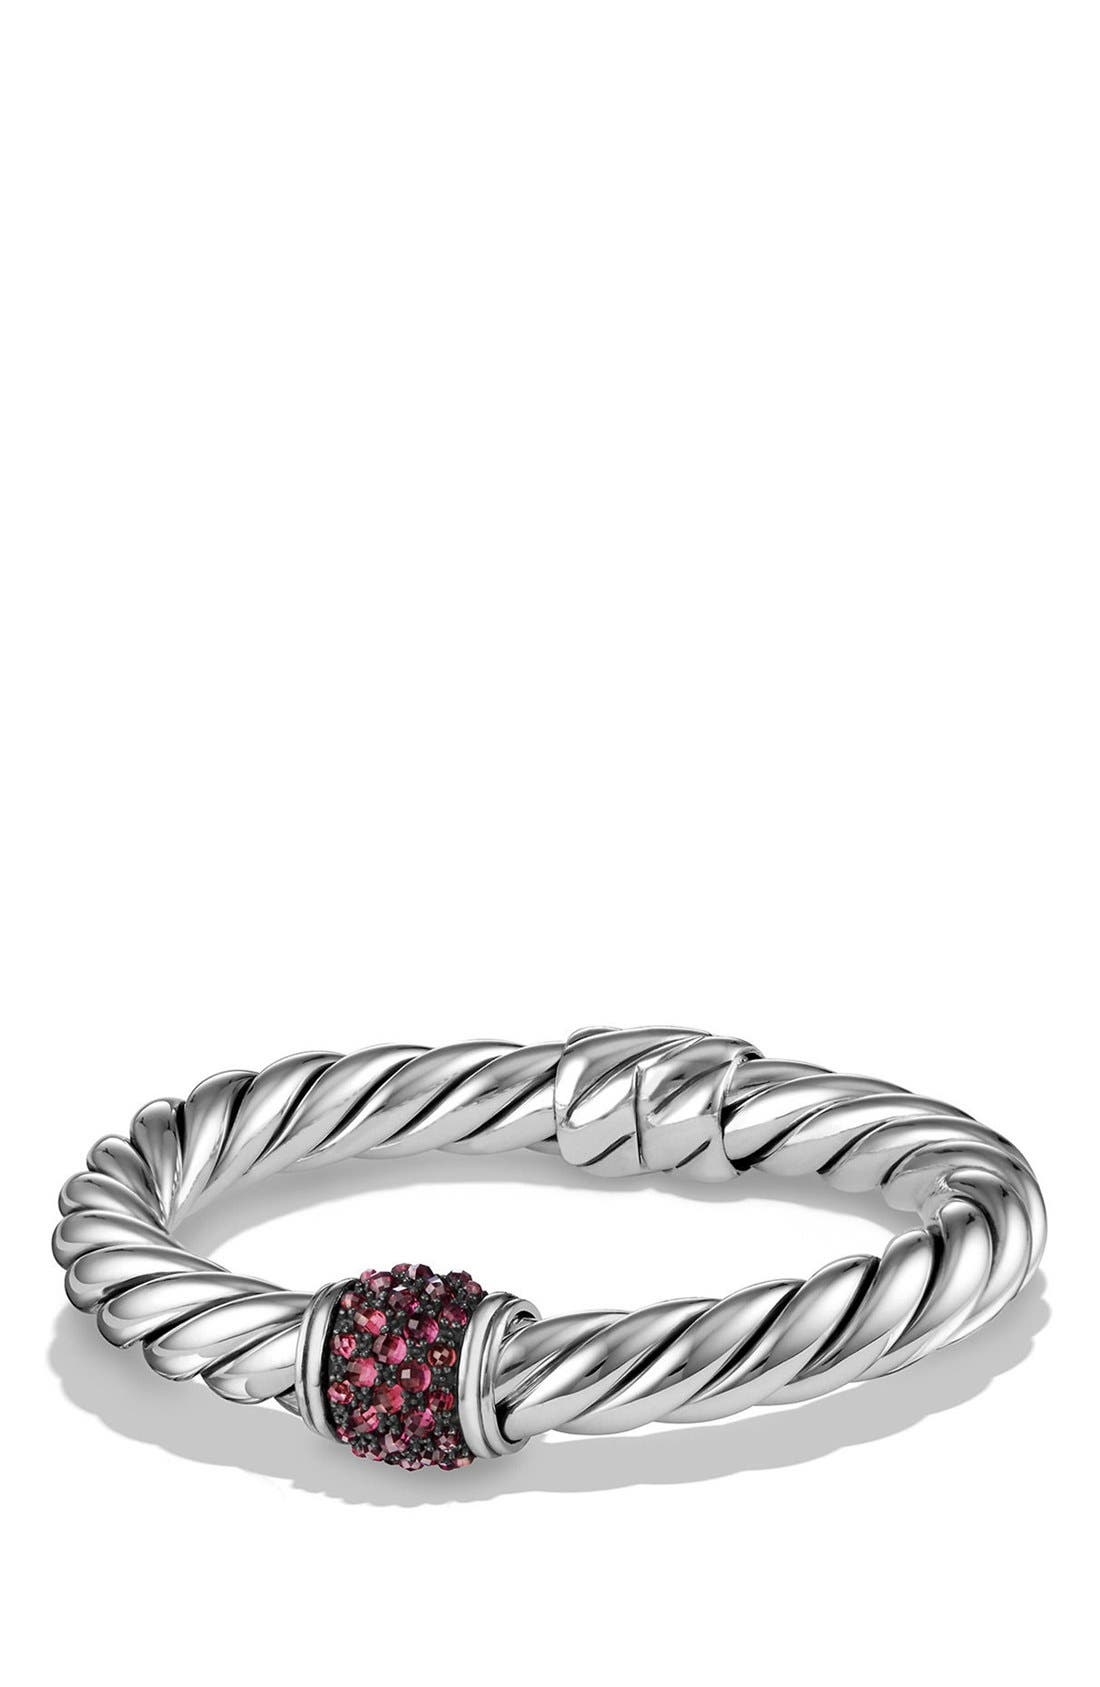 Cable Berries Hinge Bracelet,                         Main,                         color, SILVER